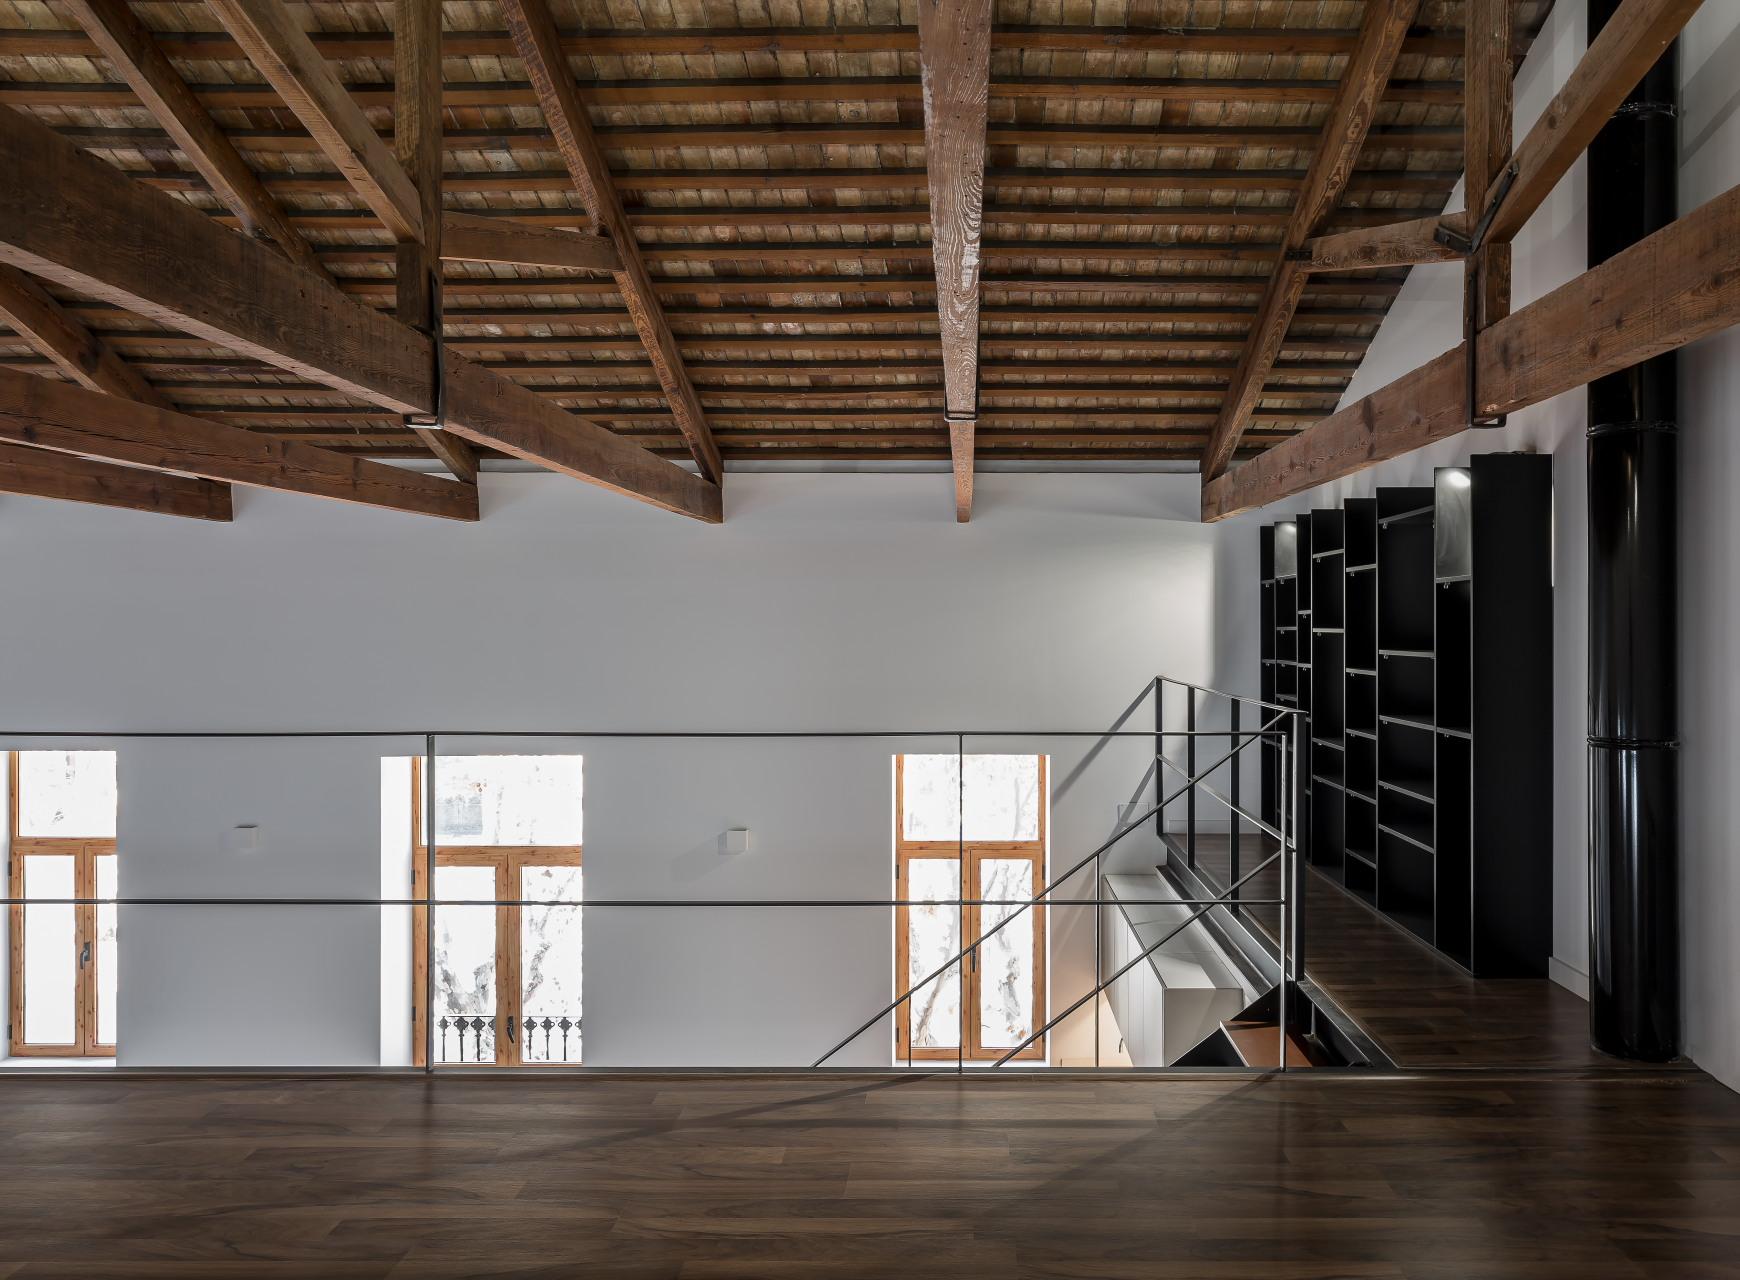 fotografia-arquitectura-valencia-german-cabo-viraje-rehabilitacion-campanar (23)